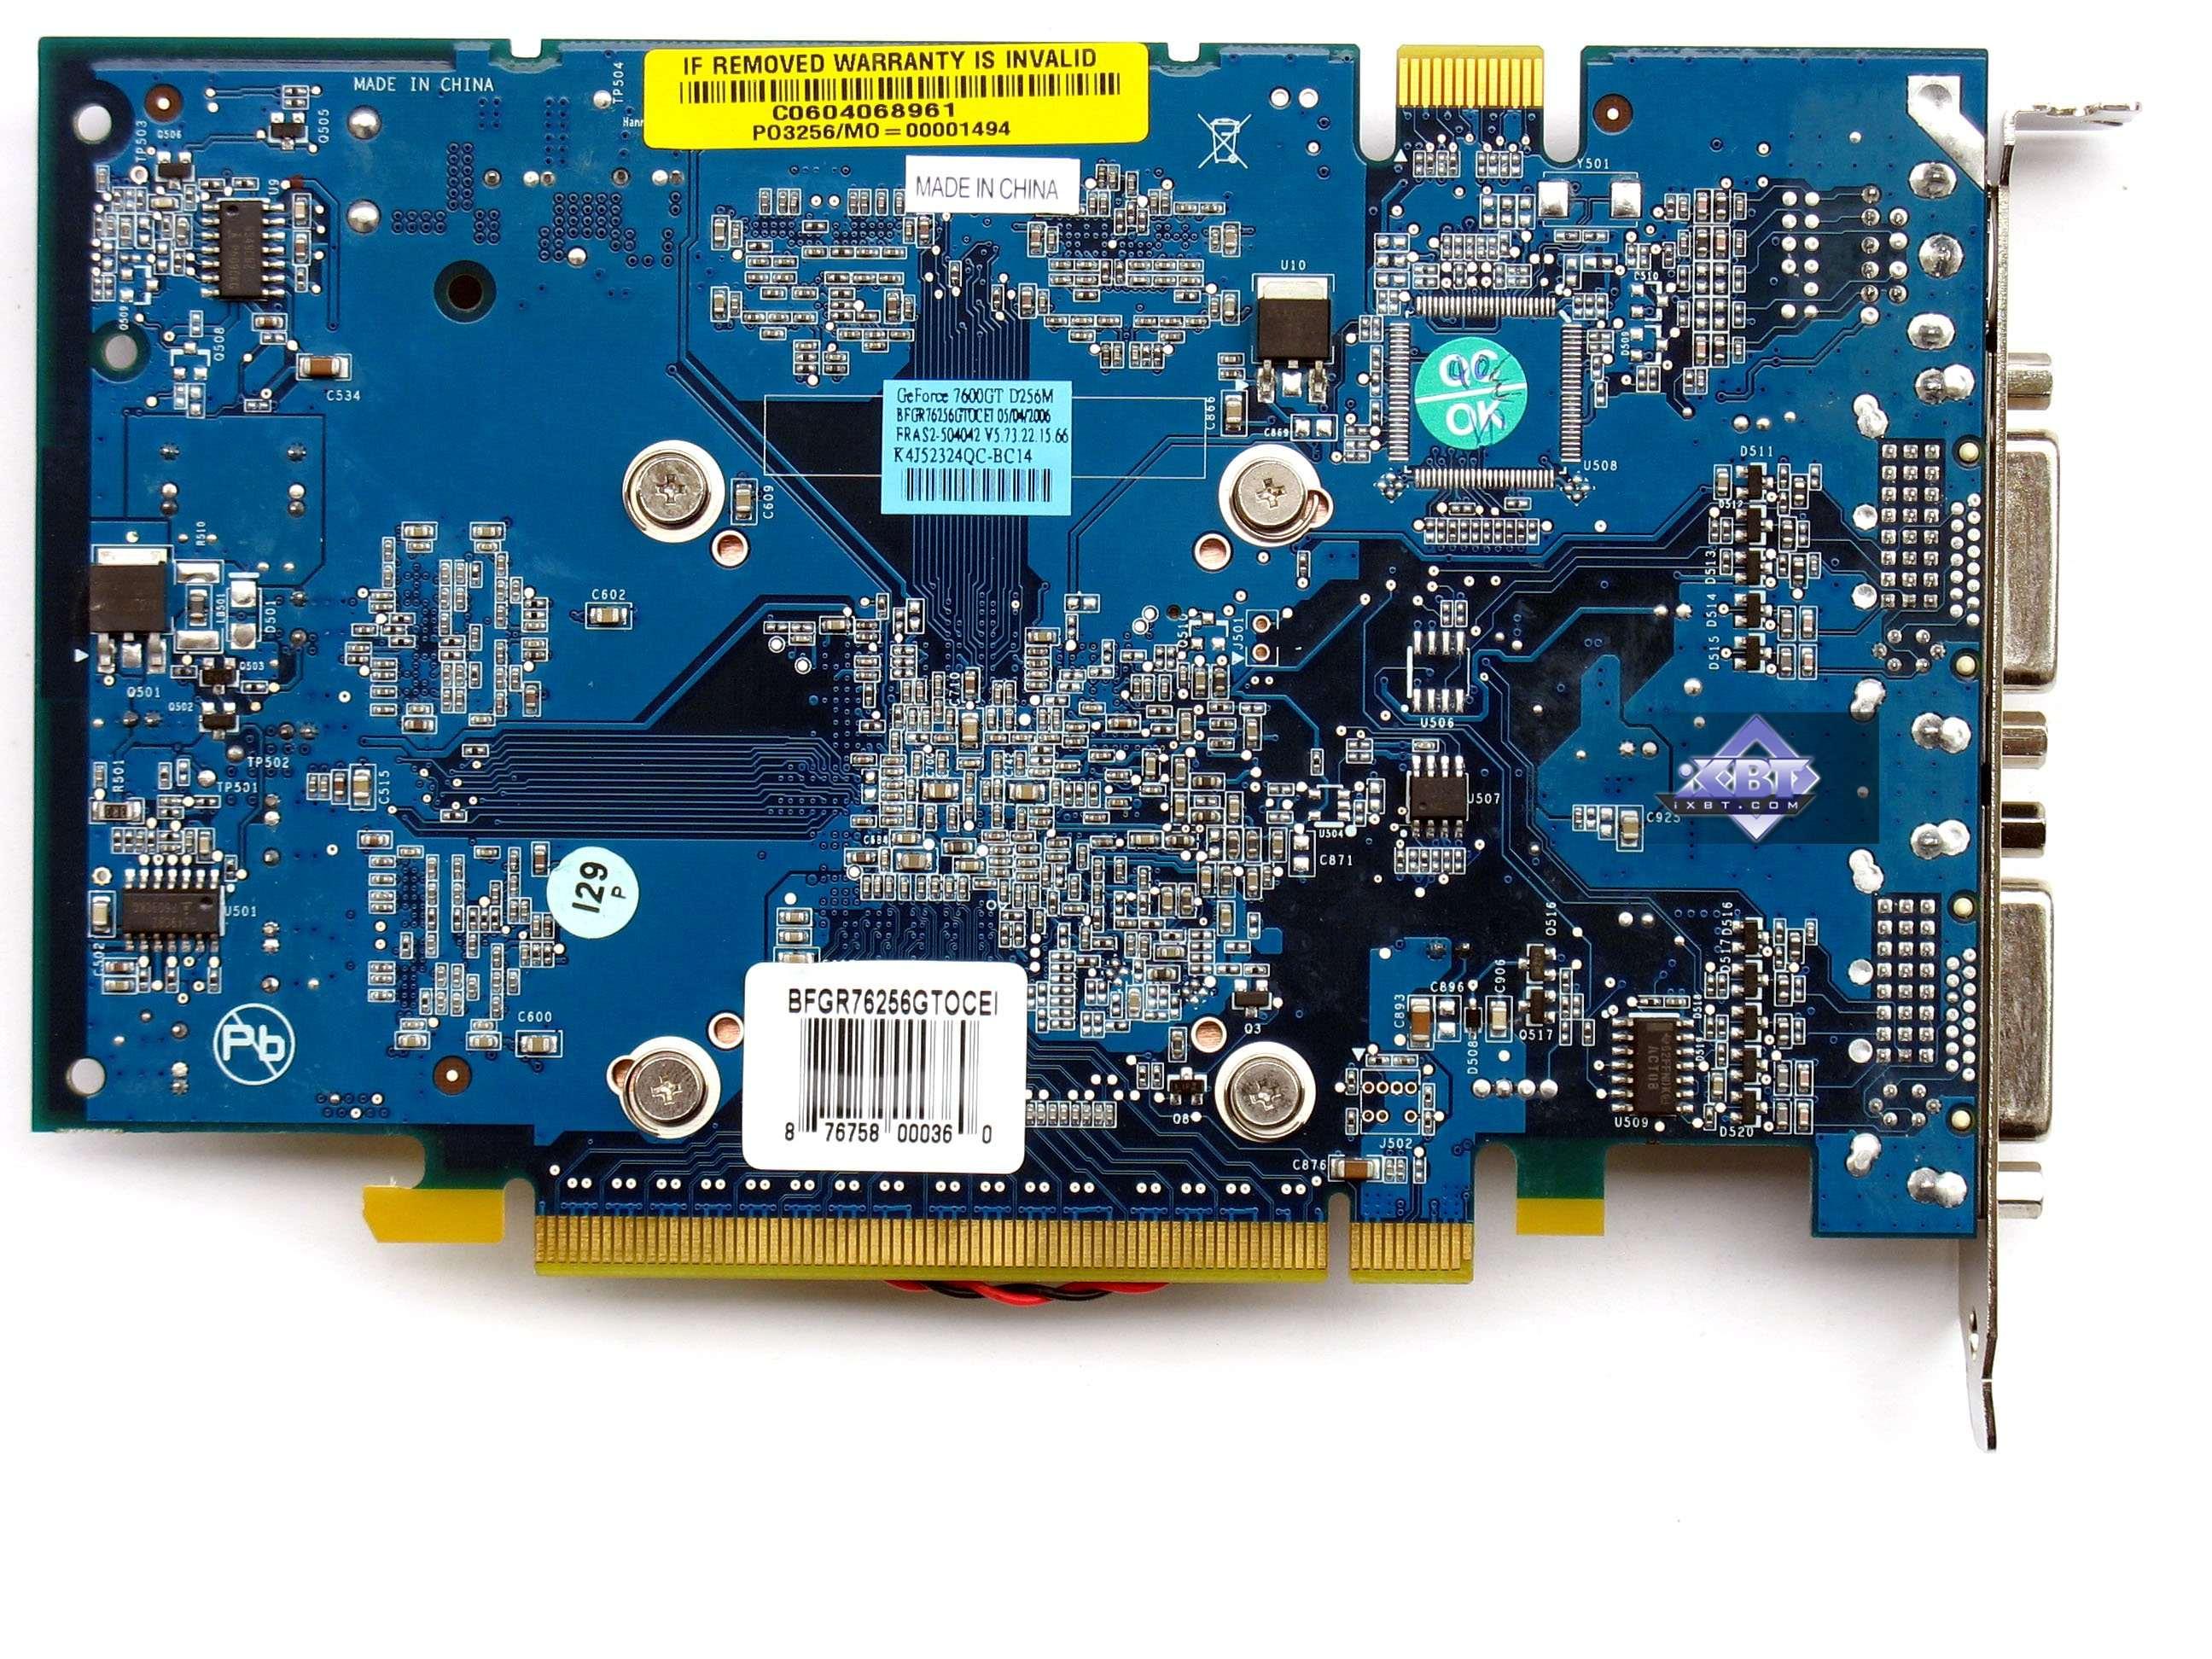 nvidia geforce 7600 gt treiber windows 7 32bit